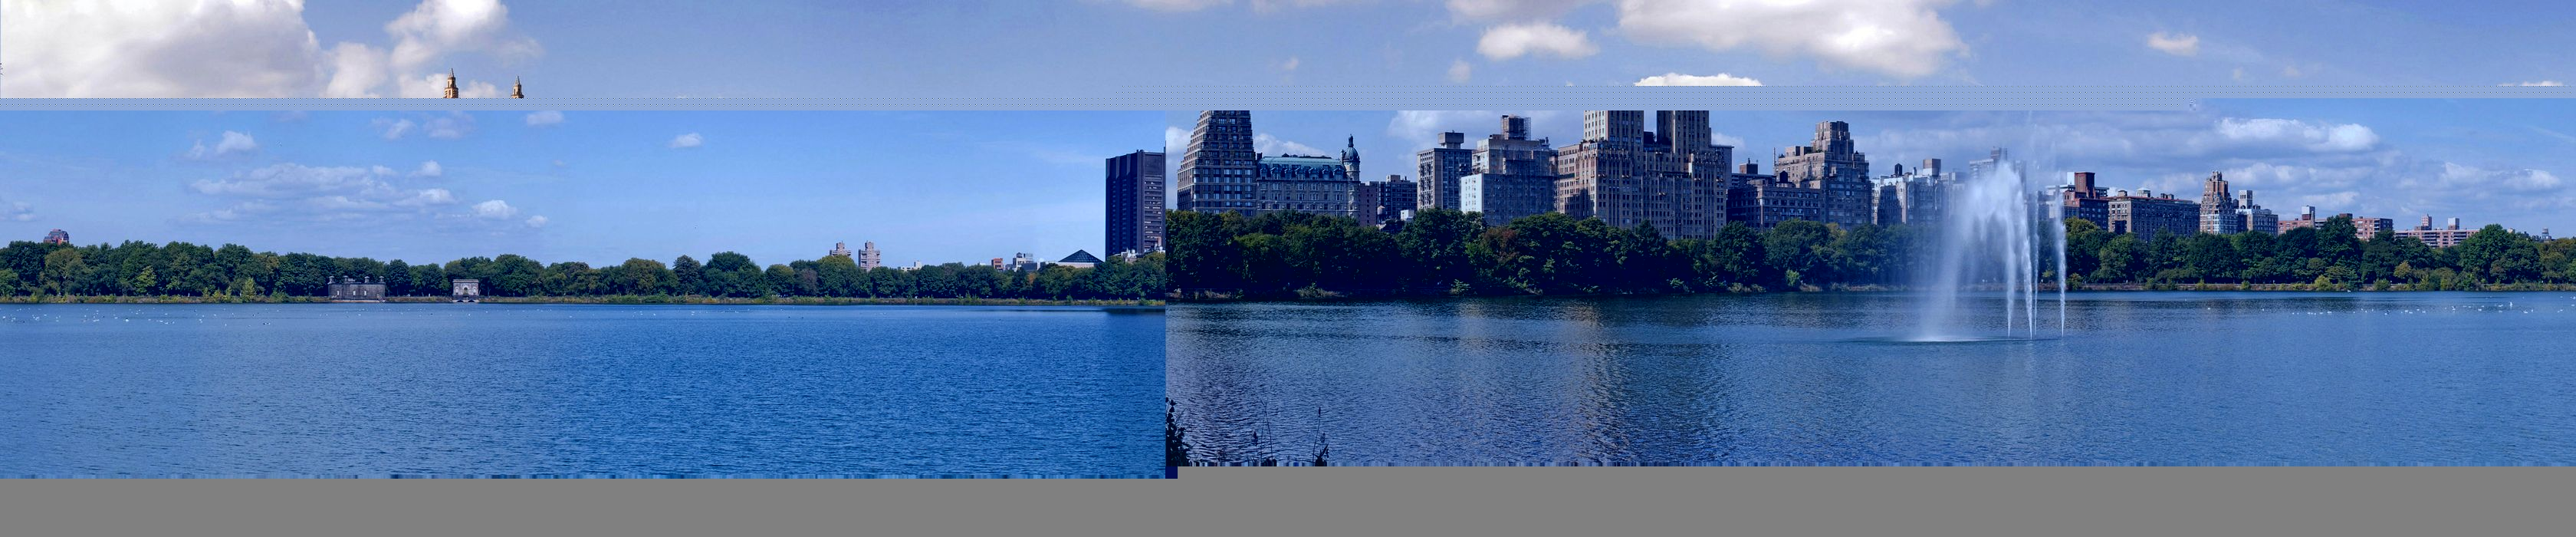 New York Central Park lake      f wallpaper